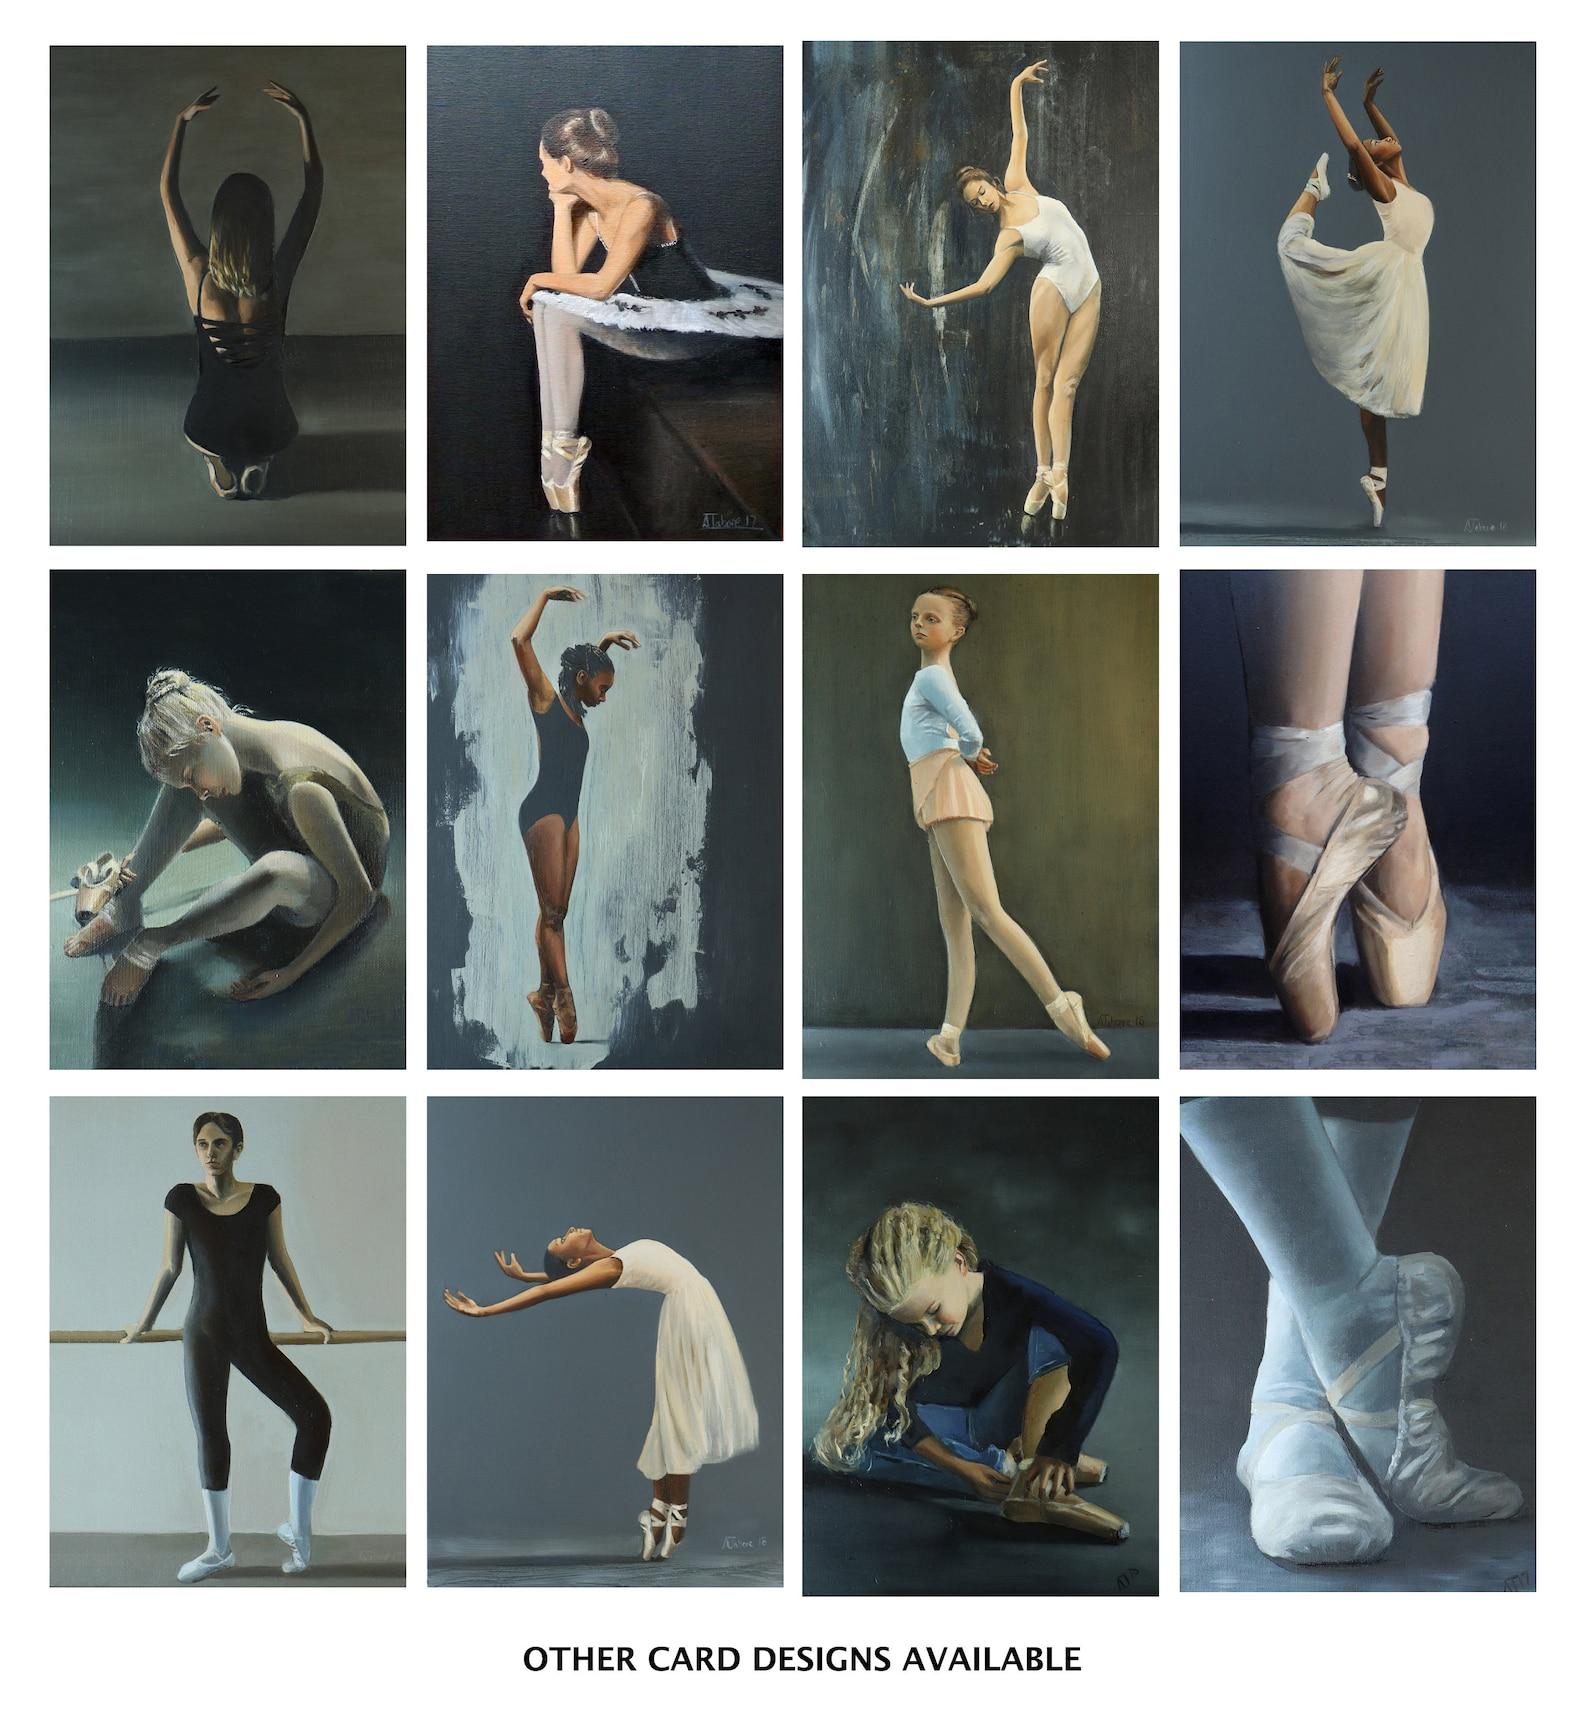 blank greeting card of young ballerina, ballet dancer on pointe, ballet artwork print // birthday cards, art prints, greetings b